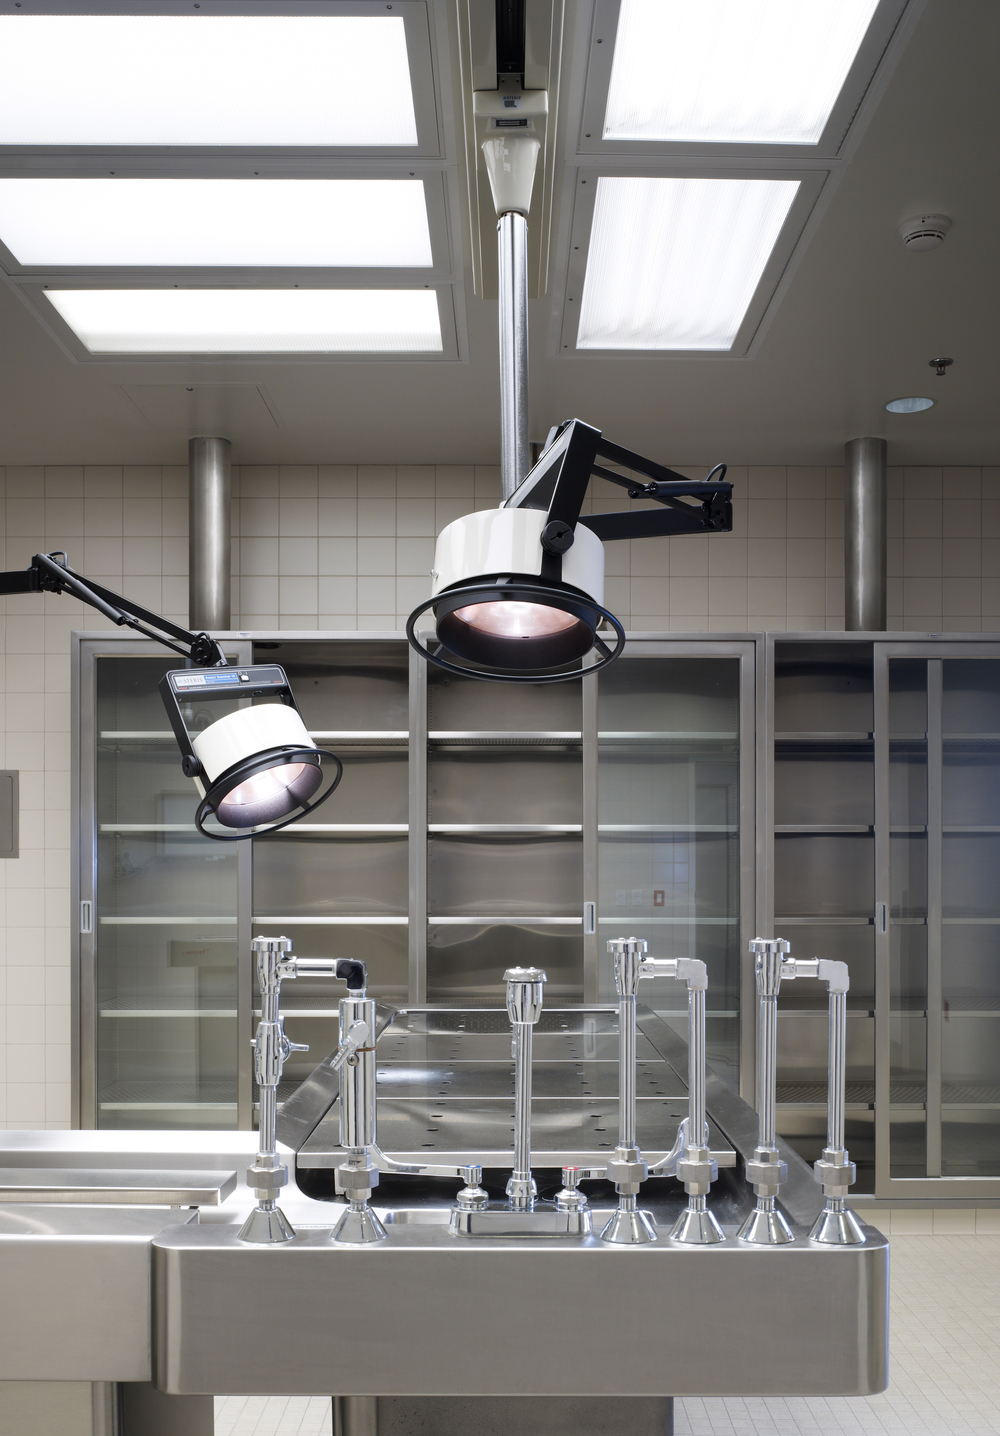 UCIrvine Douglas Hospital Interior - Operating Room 02.jpg